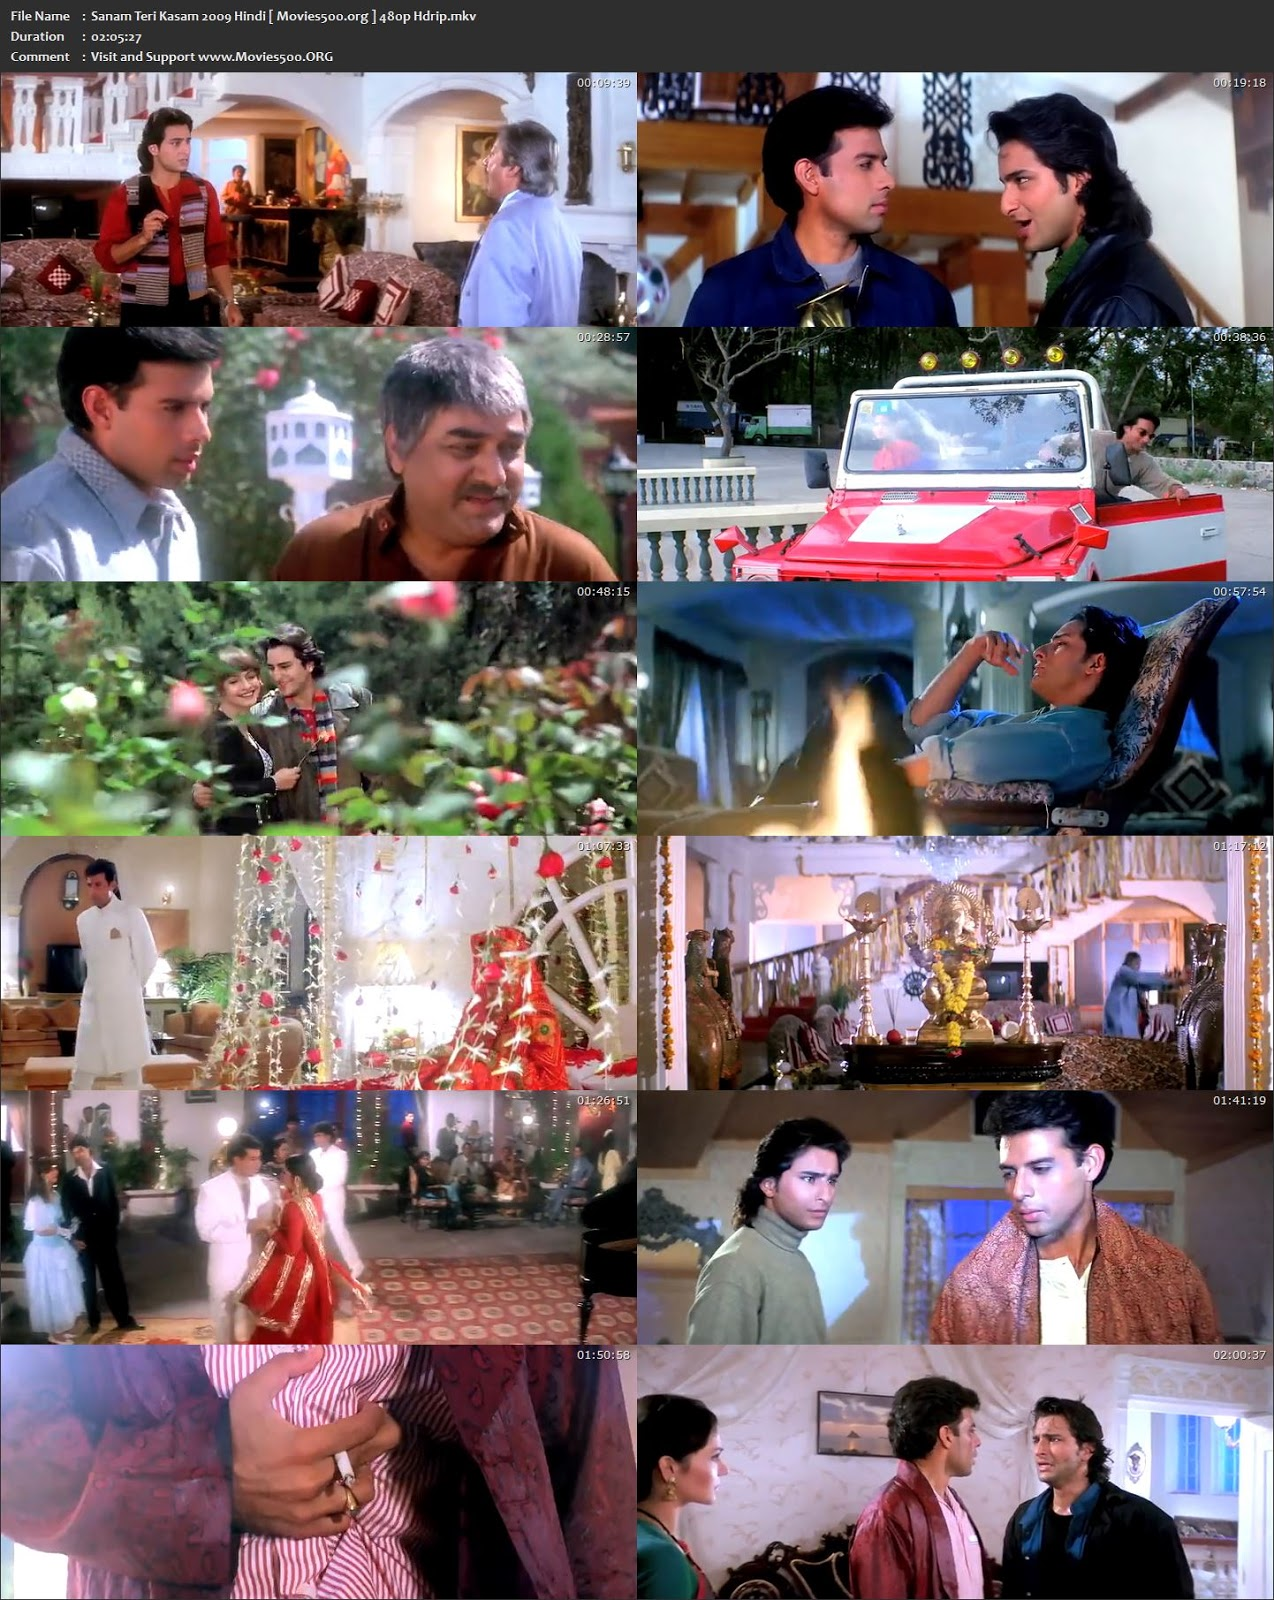 Sanam Teri Kasam 2009 Bollywood 300MB HDRip 480p at movies500.site